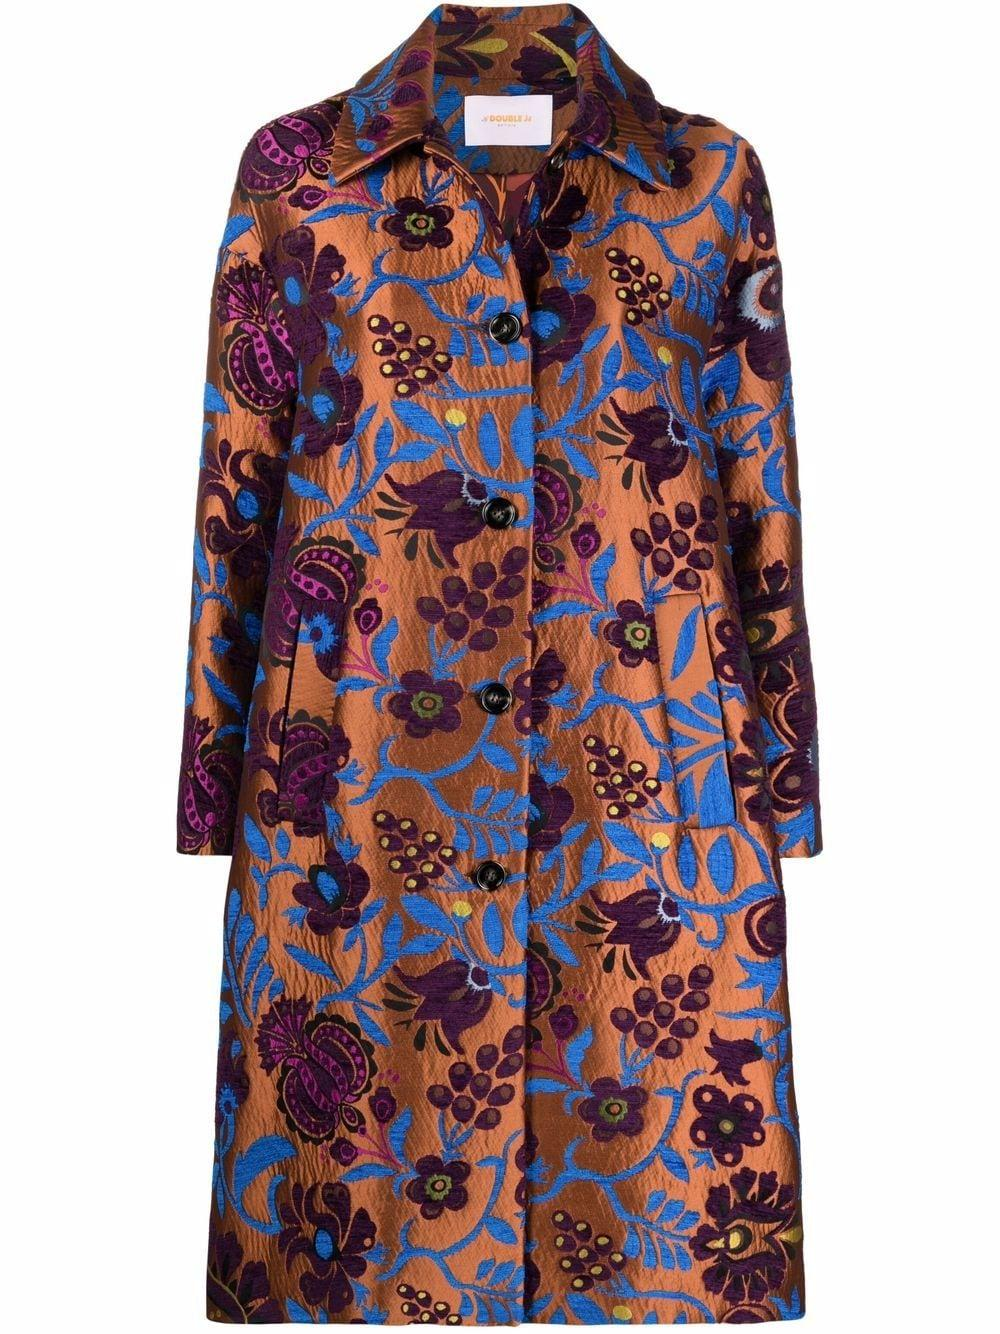 Boxy Floral Jacquard Coat Item # JAC0014-JAC025